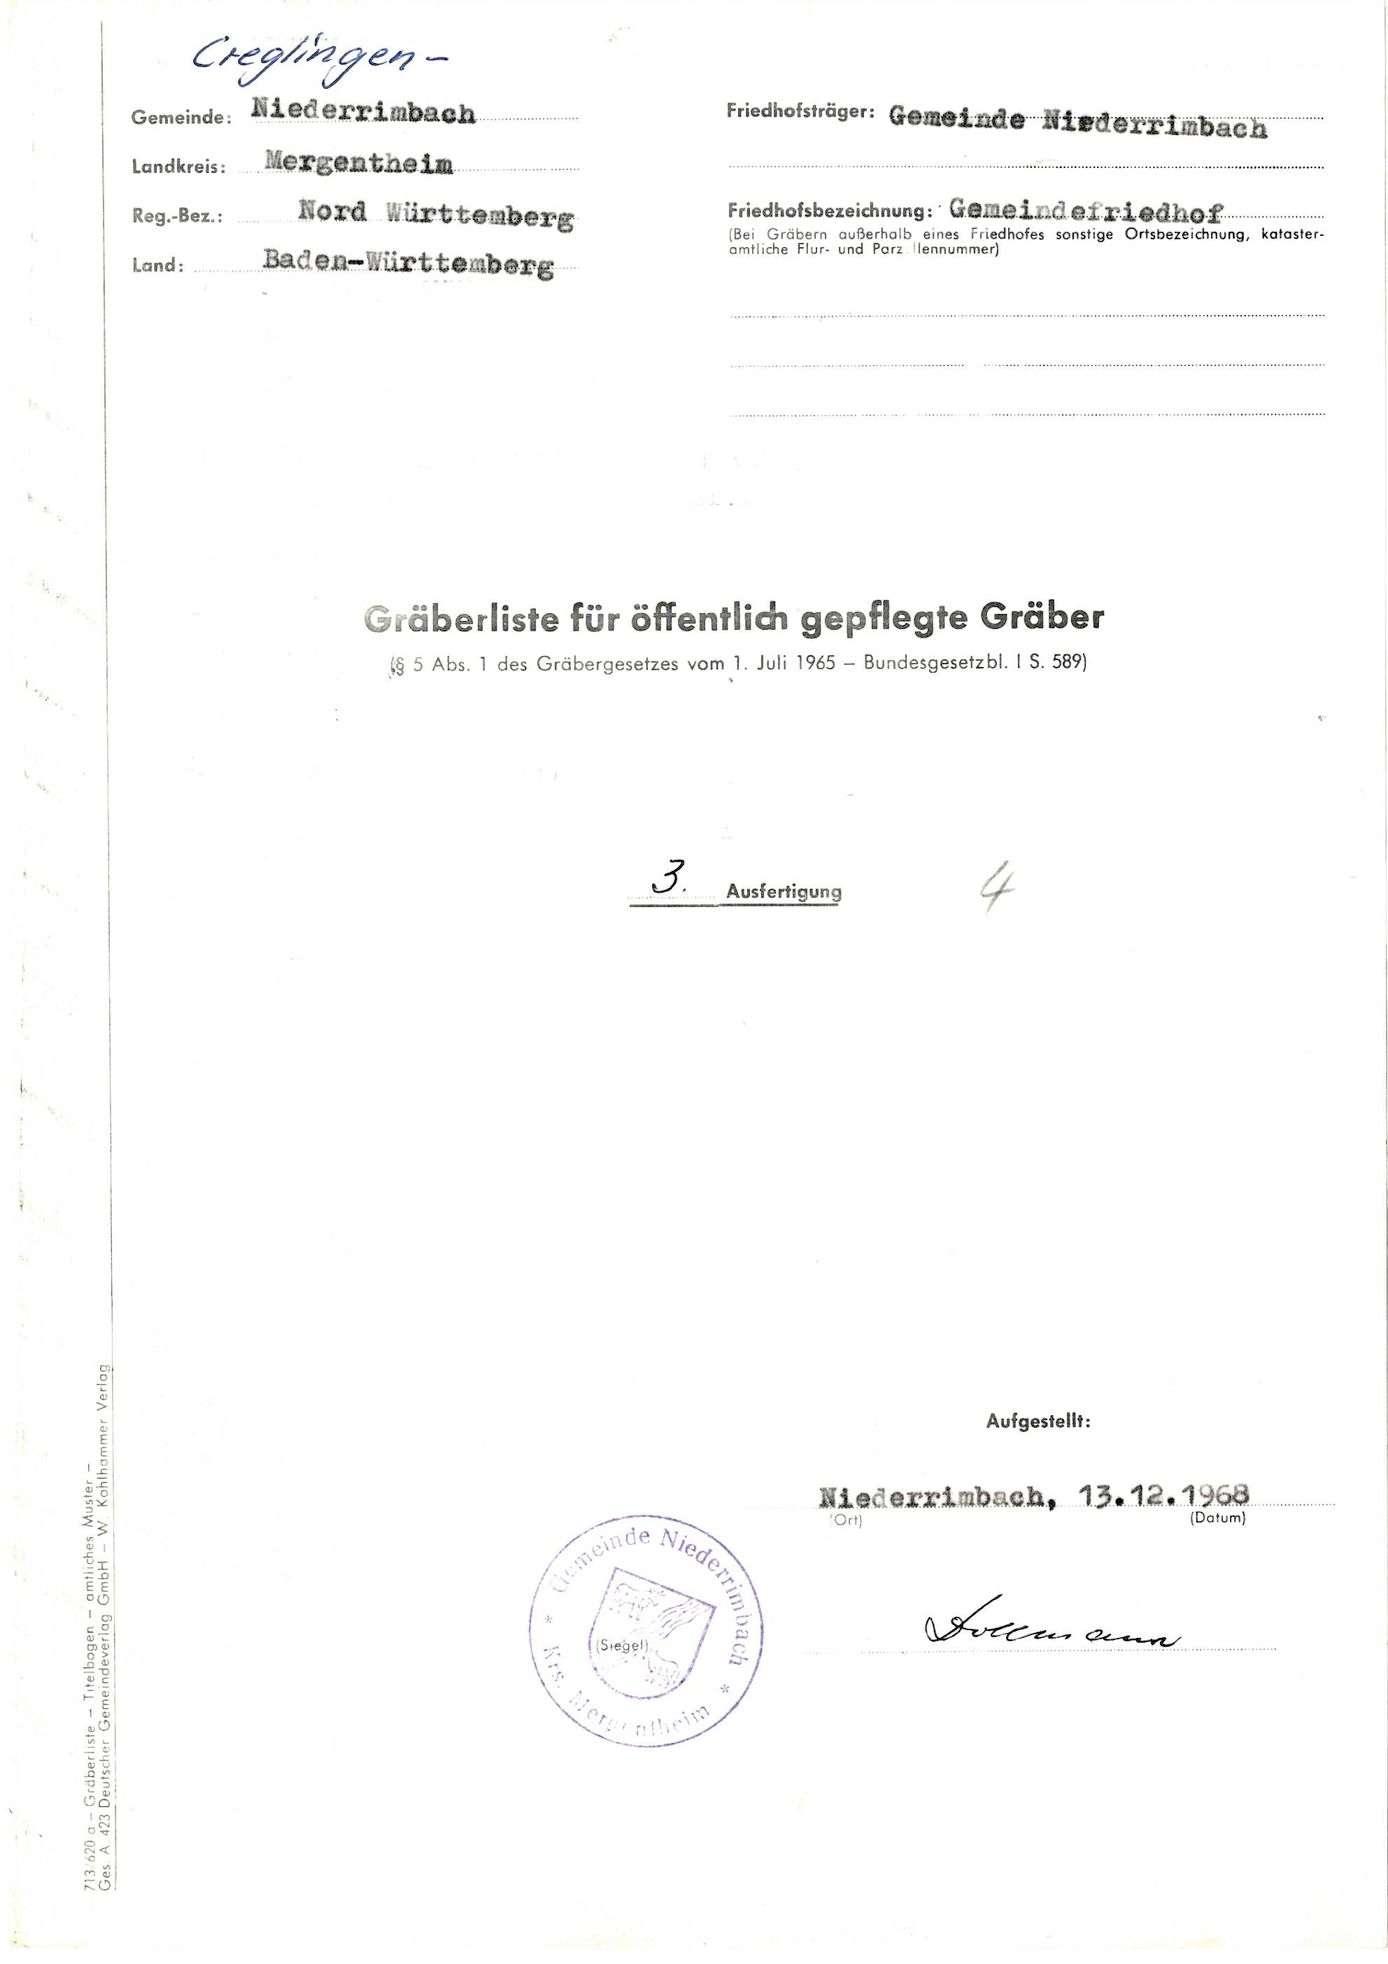 Niederrimbach, Bild 1